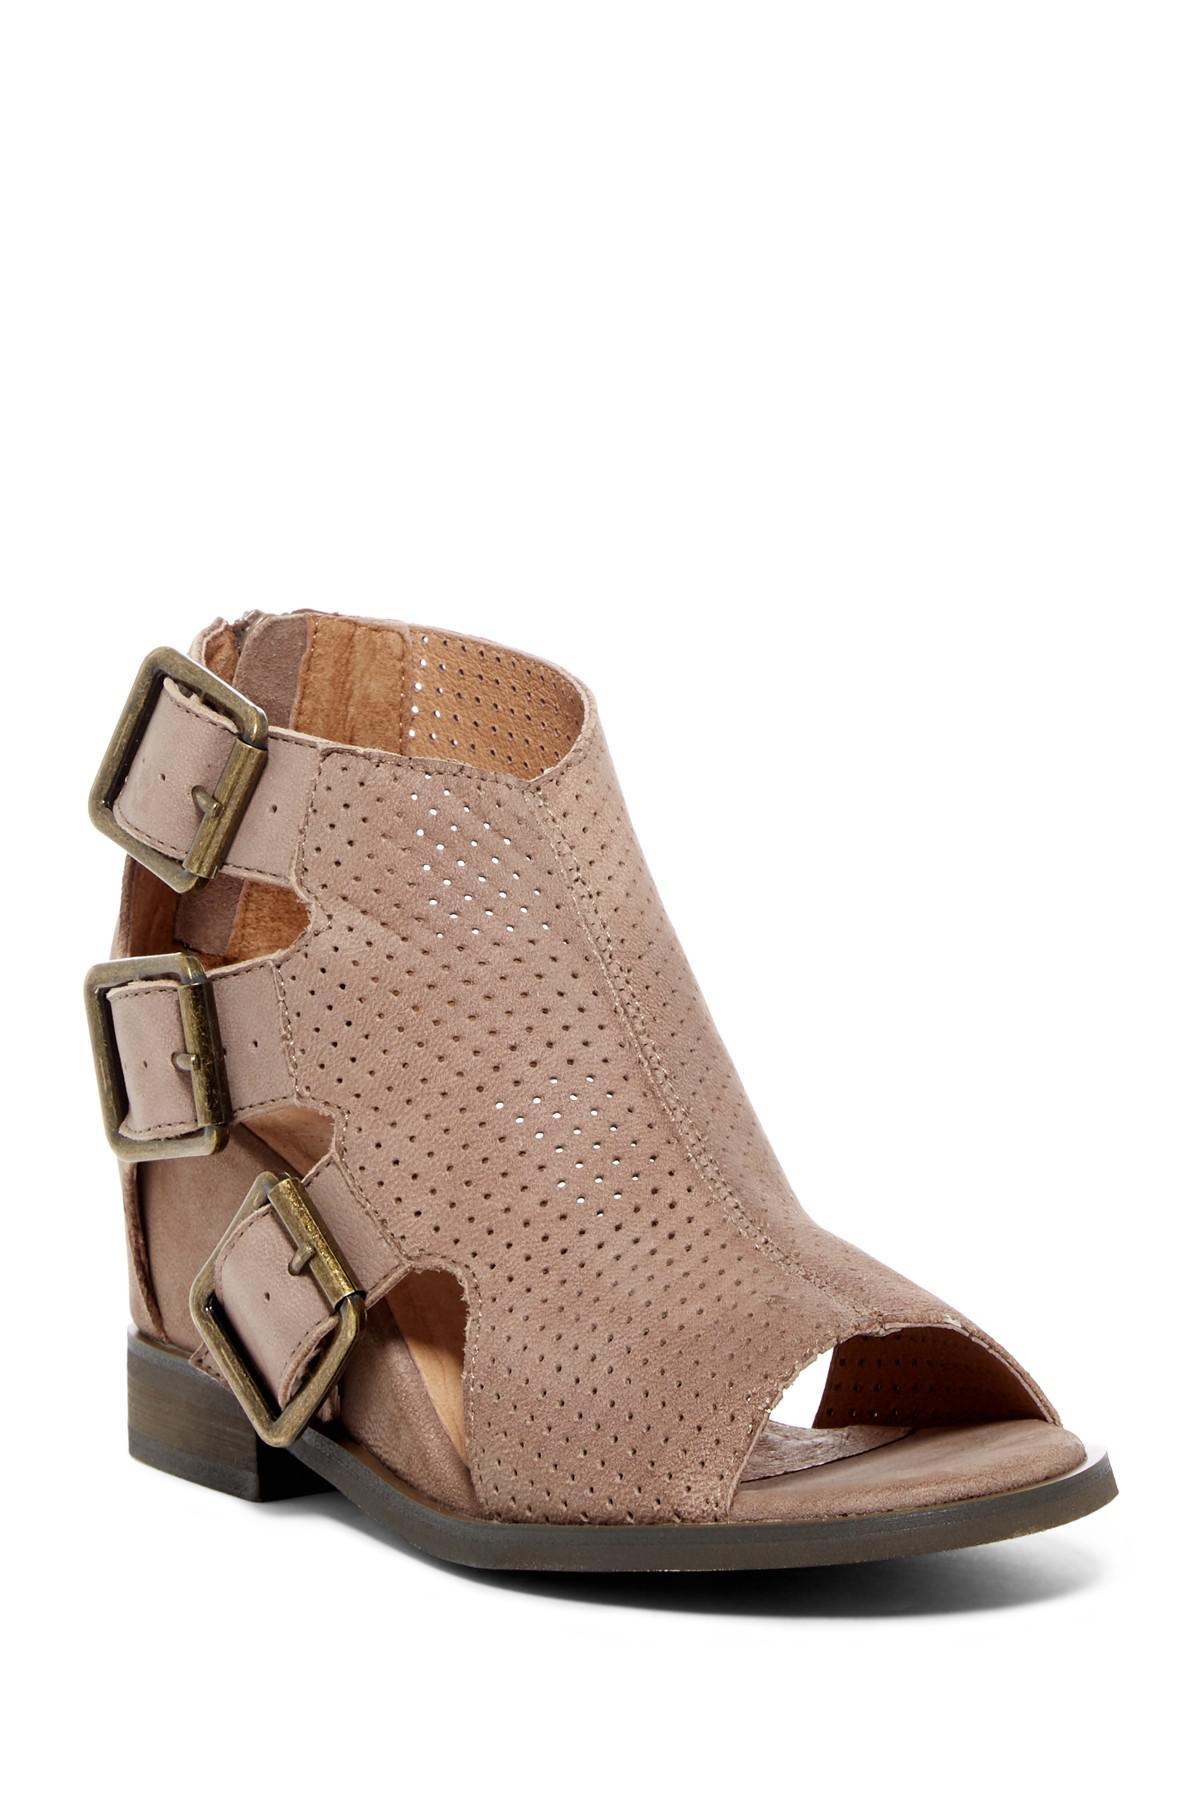 Lyst Chocolat Blu Nadia Perforated Leather Wedge Sandal